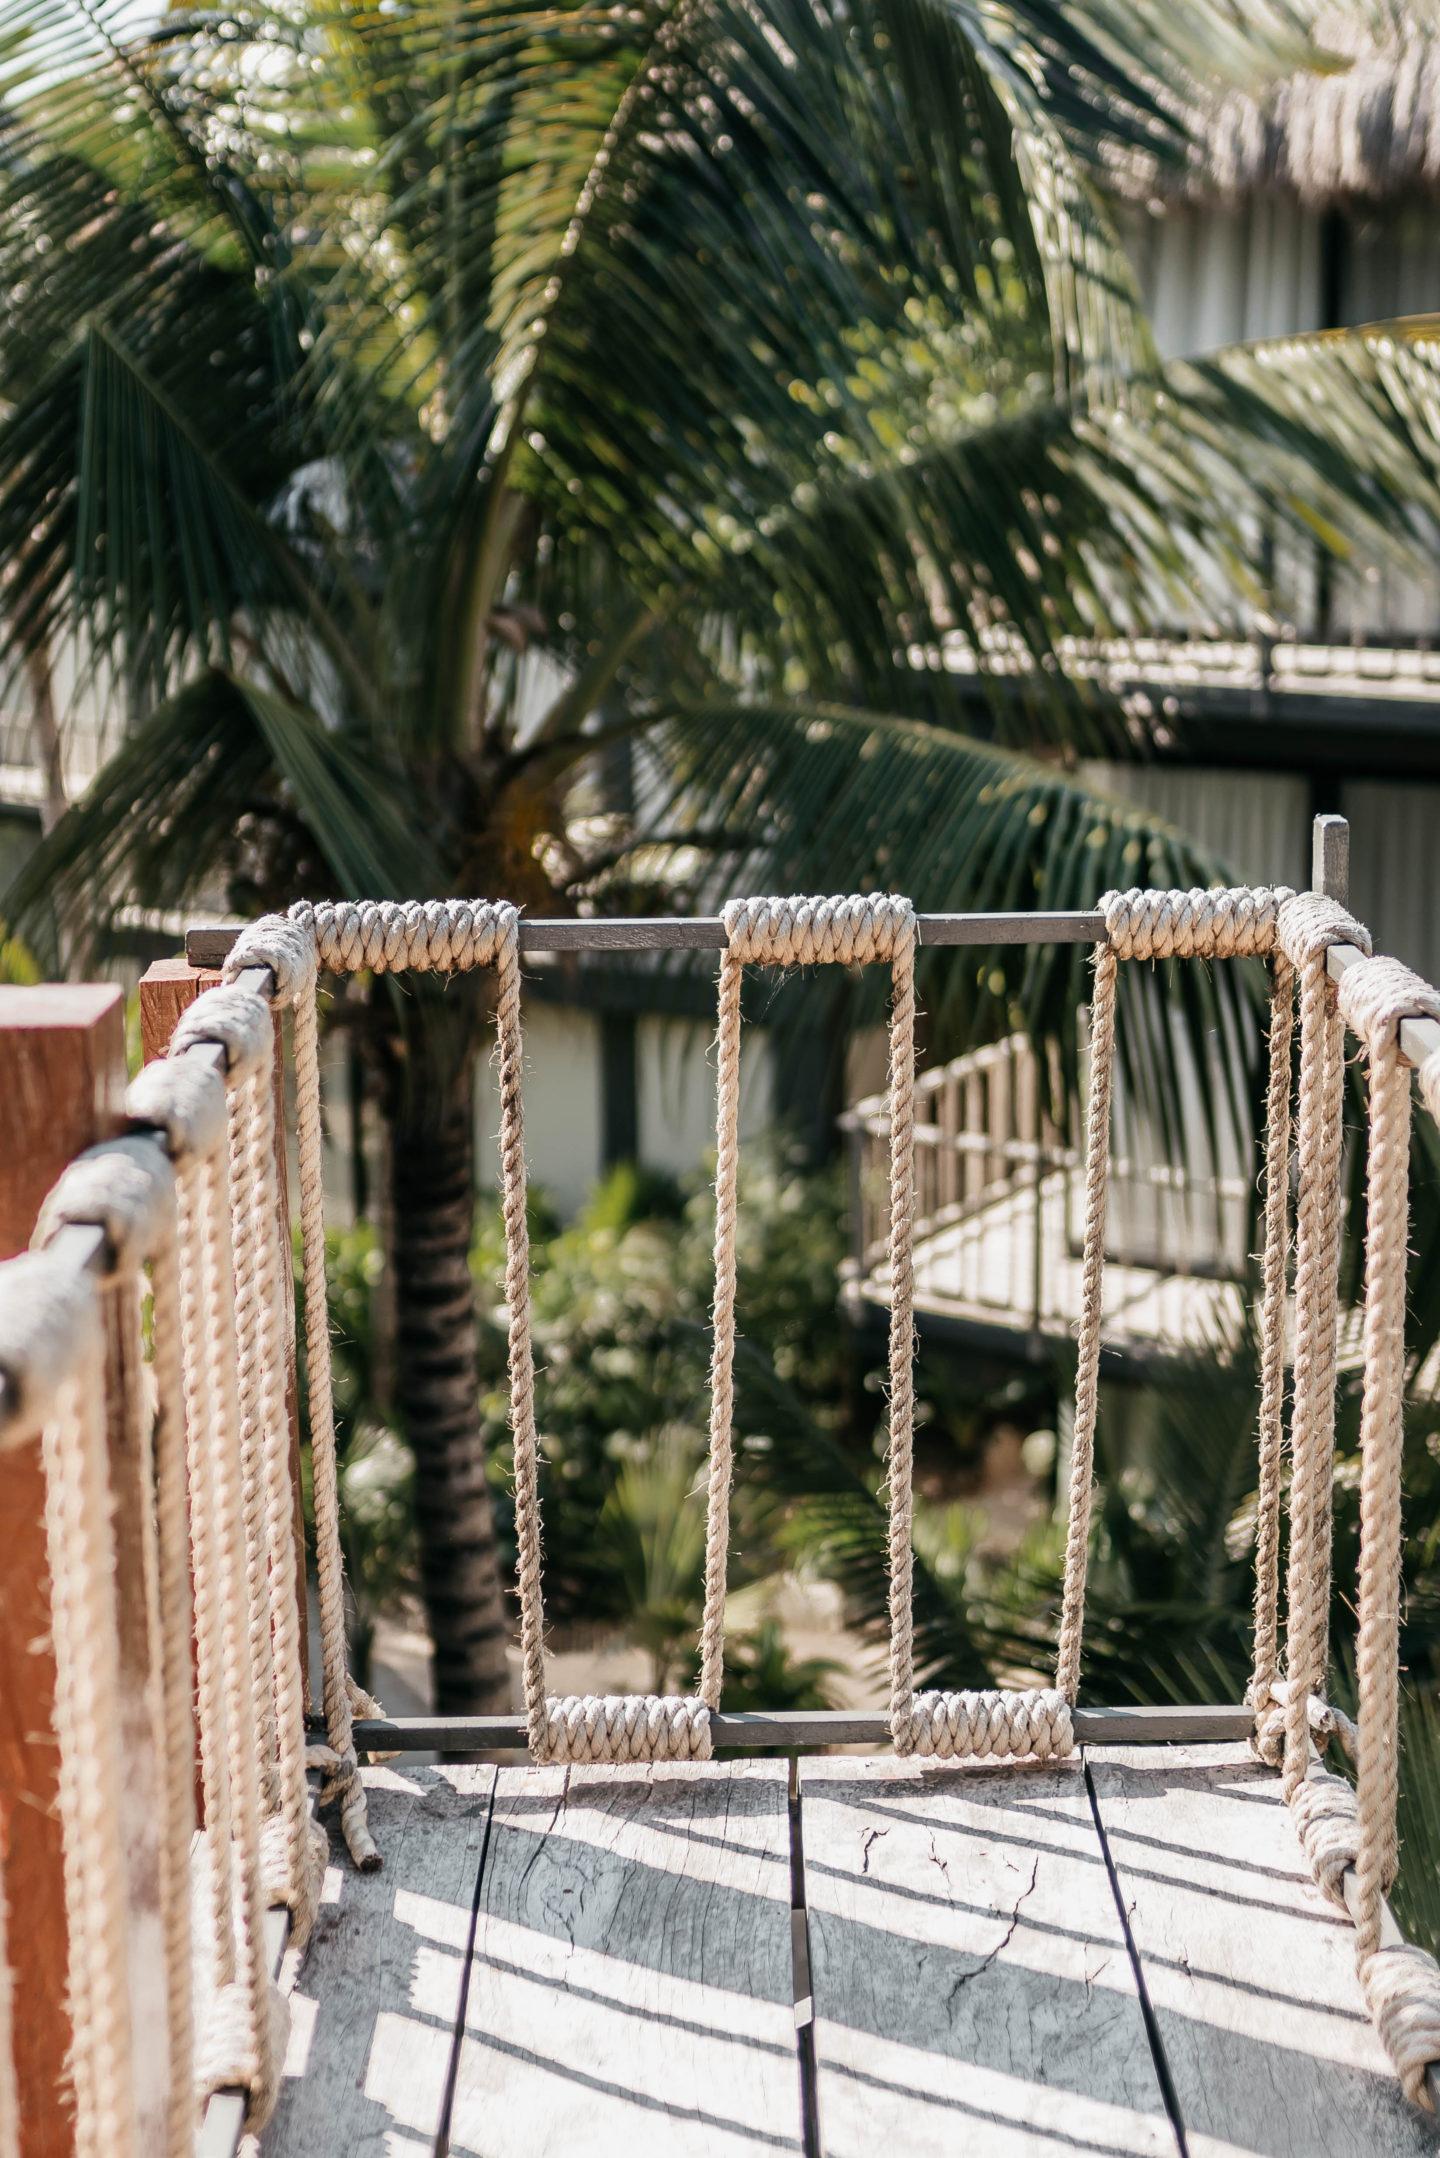 My Stay at Tata Tulum | The Jeneralist (Luxury)